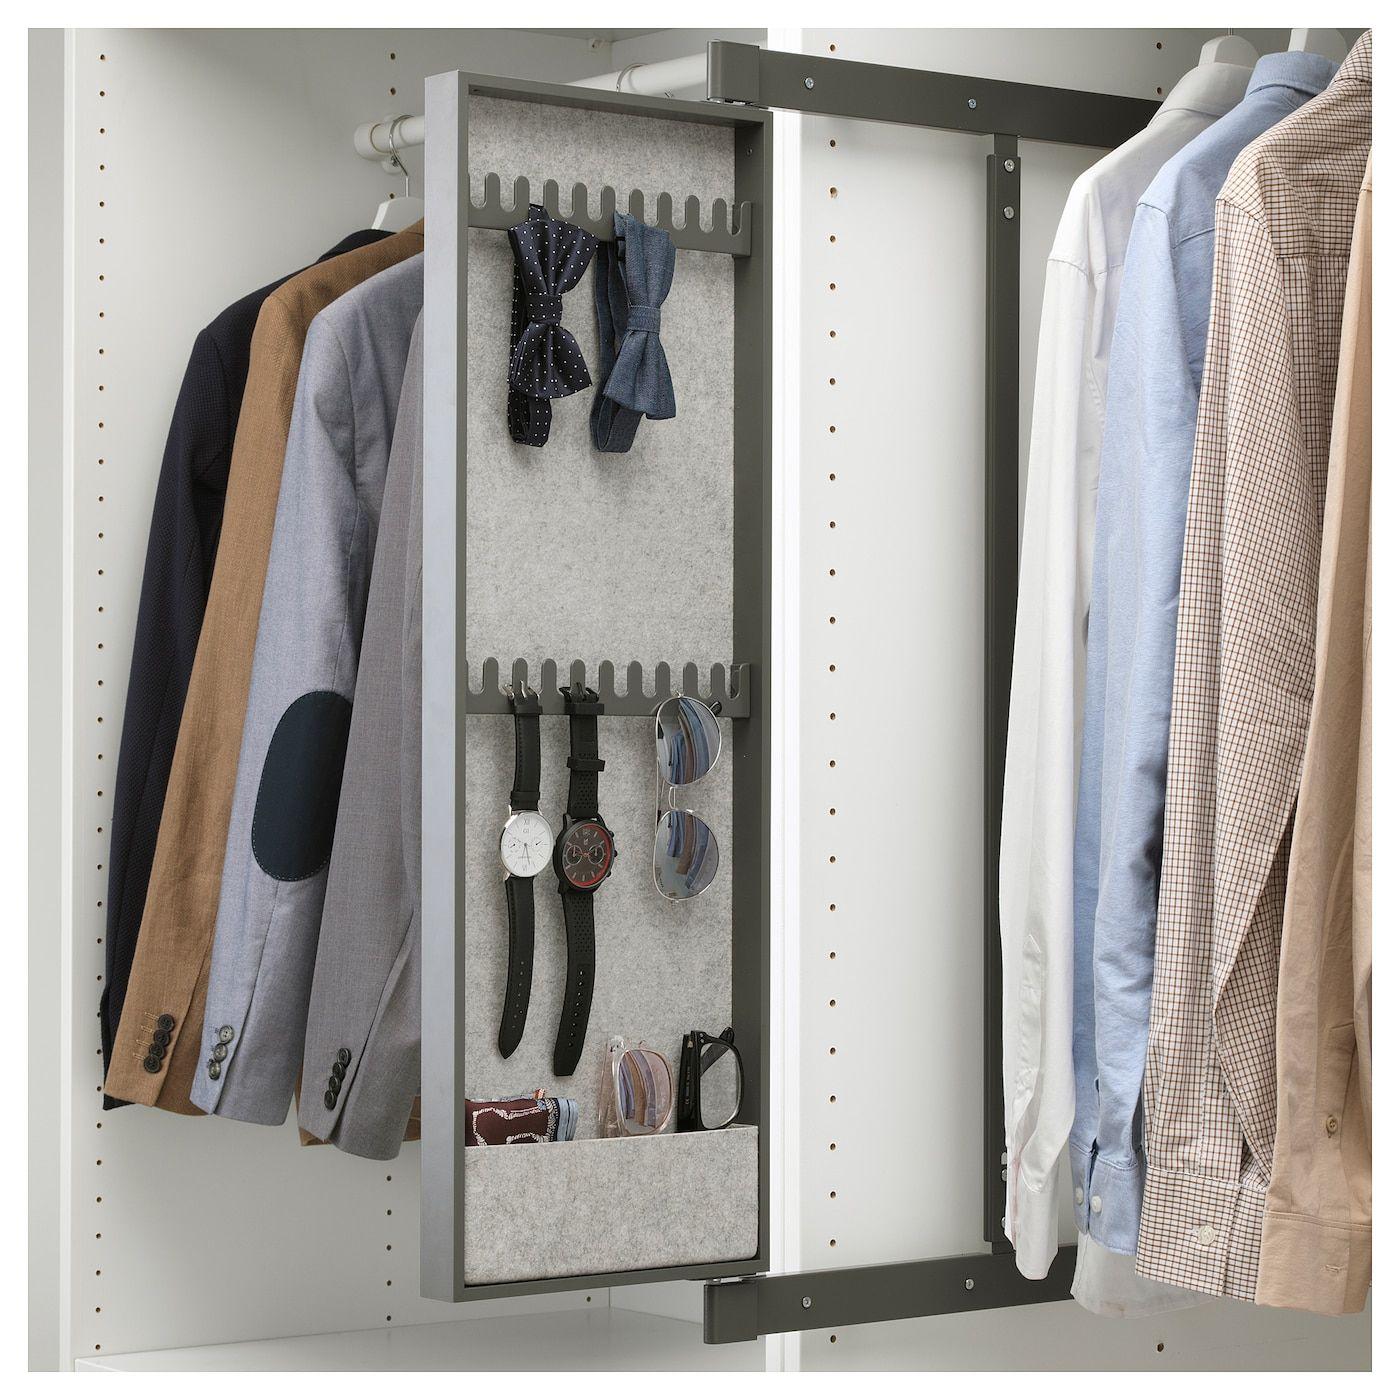 Komplement in 2020 Mirror with hooks, Ikea komplement, Ikea